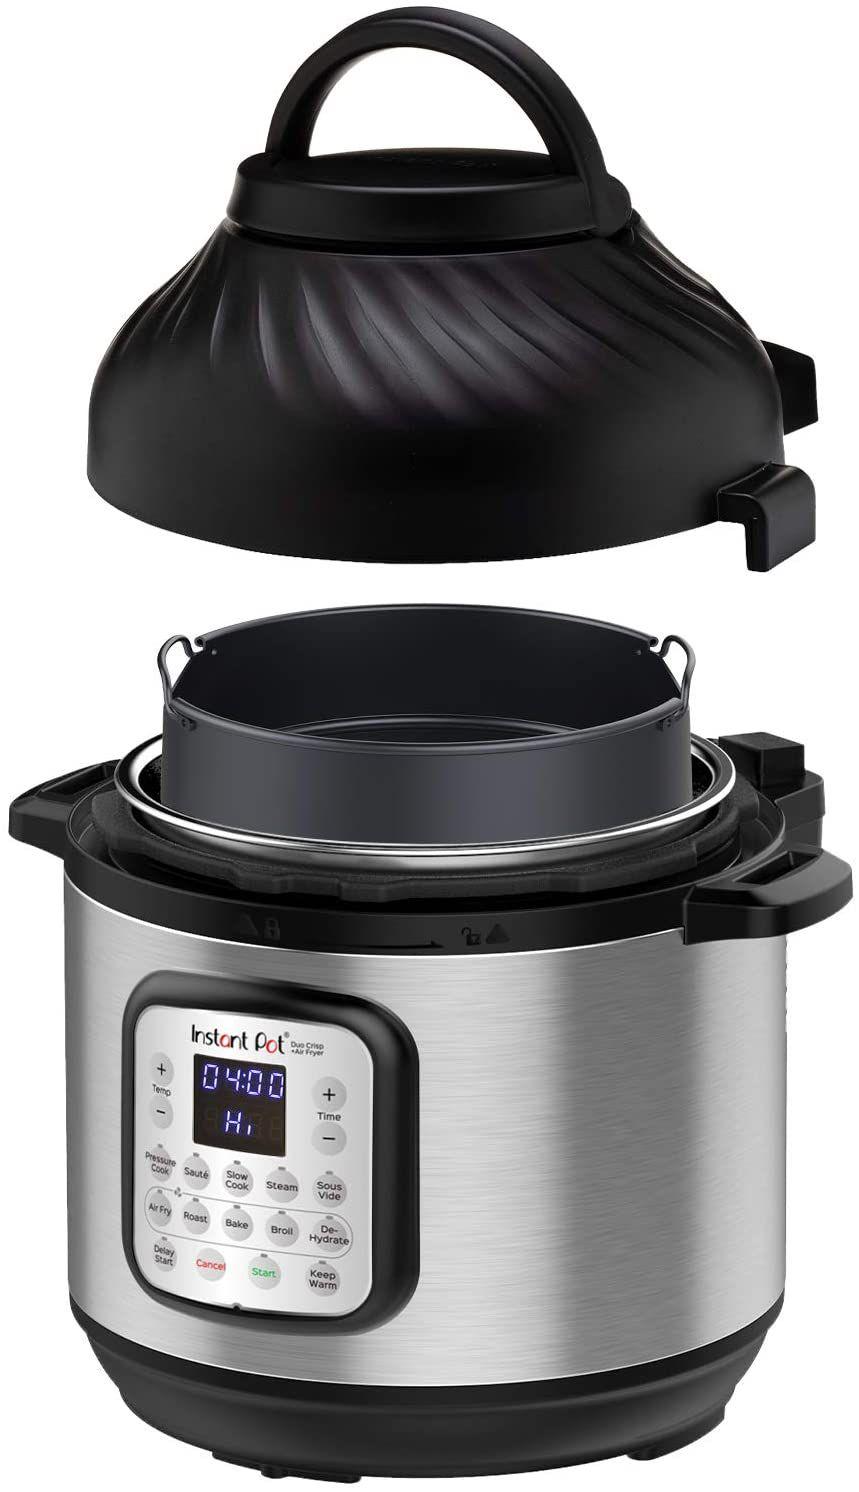 Instant Pot Duo Crisp 11 in 1